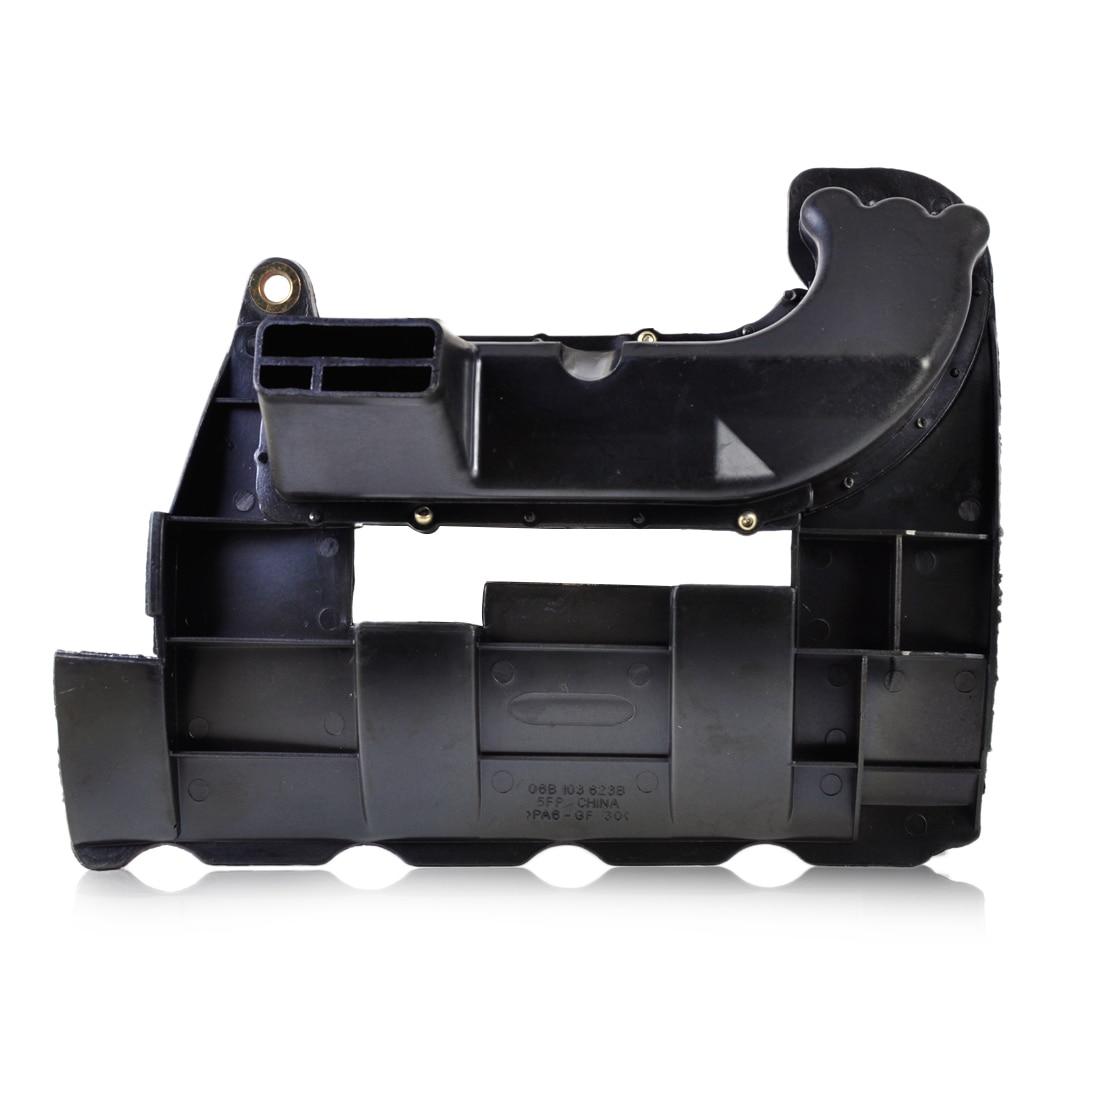 DWCX Oil Pan Restrictor Baffle Plate 06B103623C 06B 103 623 C for VW BEETLE JETTA GOLF PASSAT POLO SHARAN TOURAN AUDI A4 A6 TT